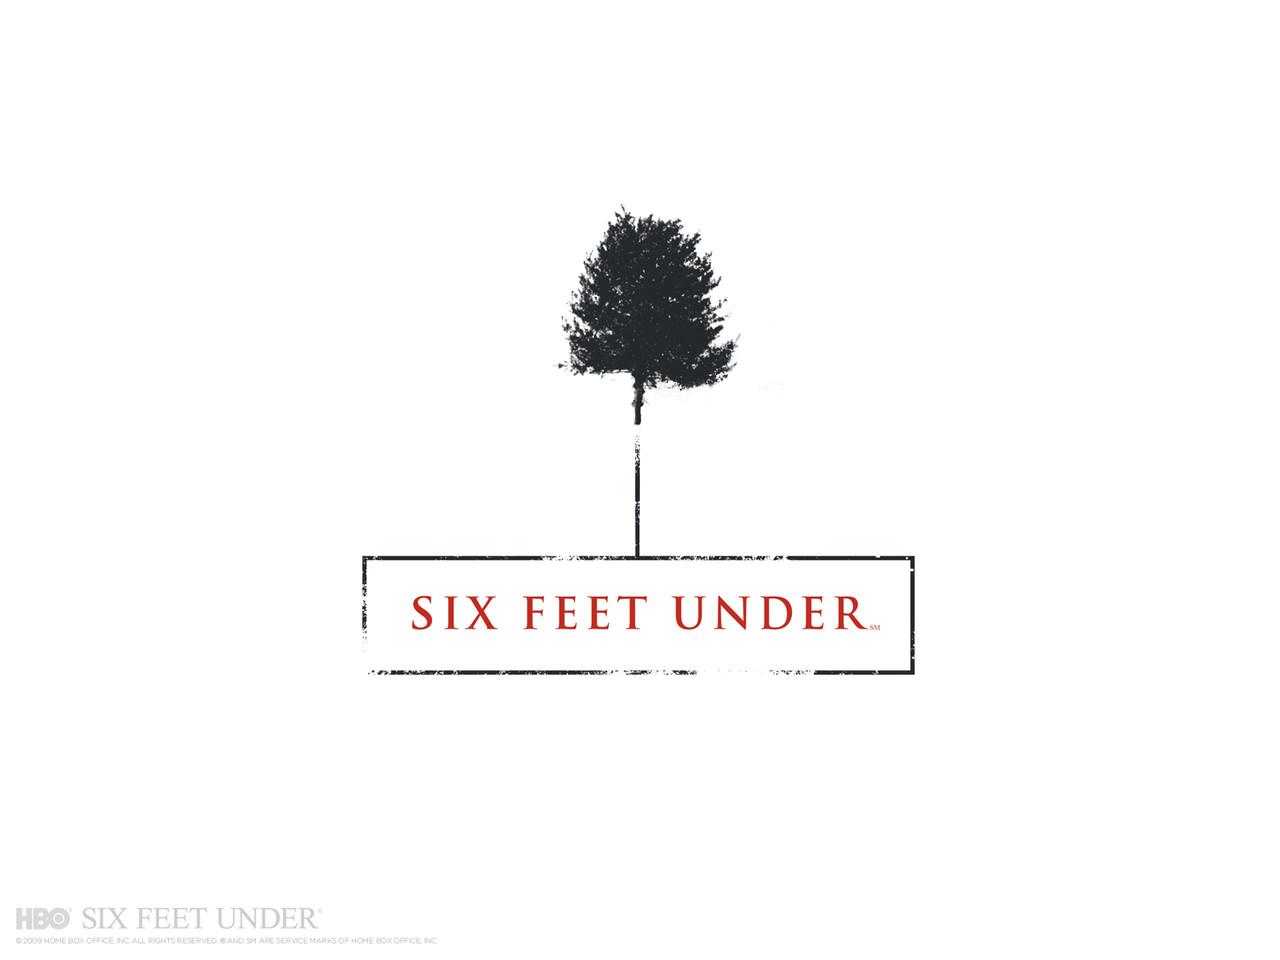 six feet under logo